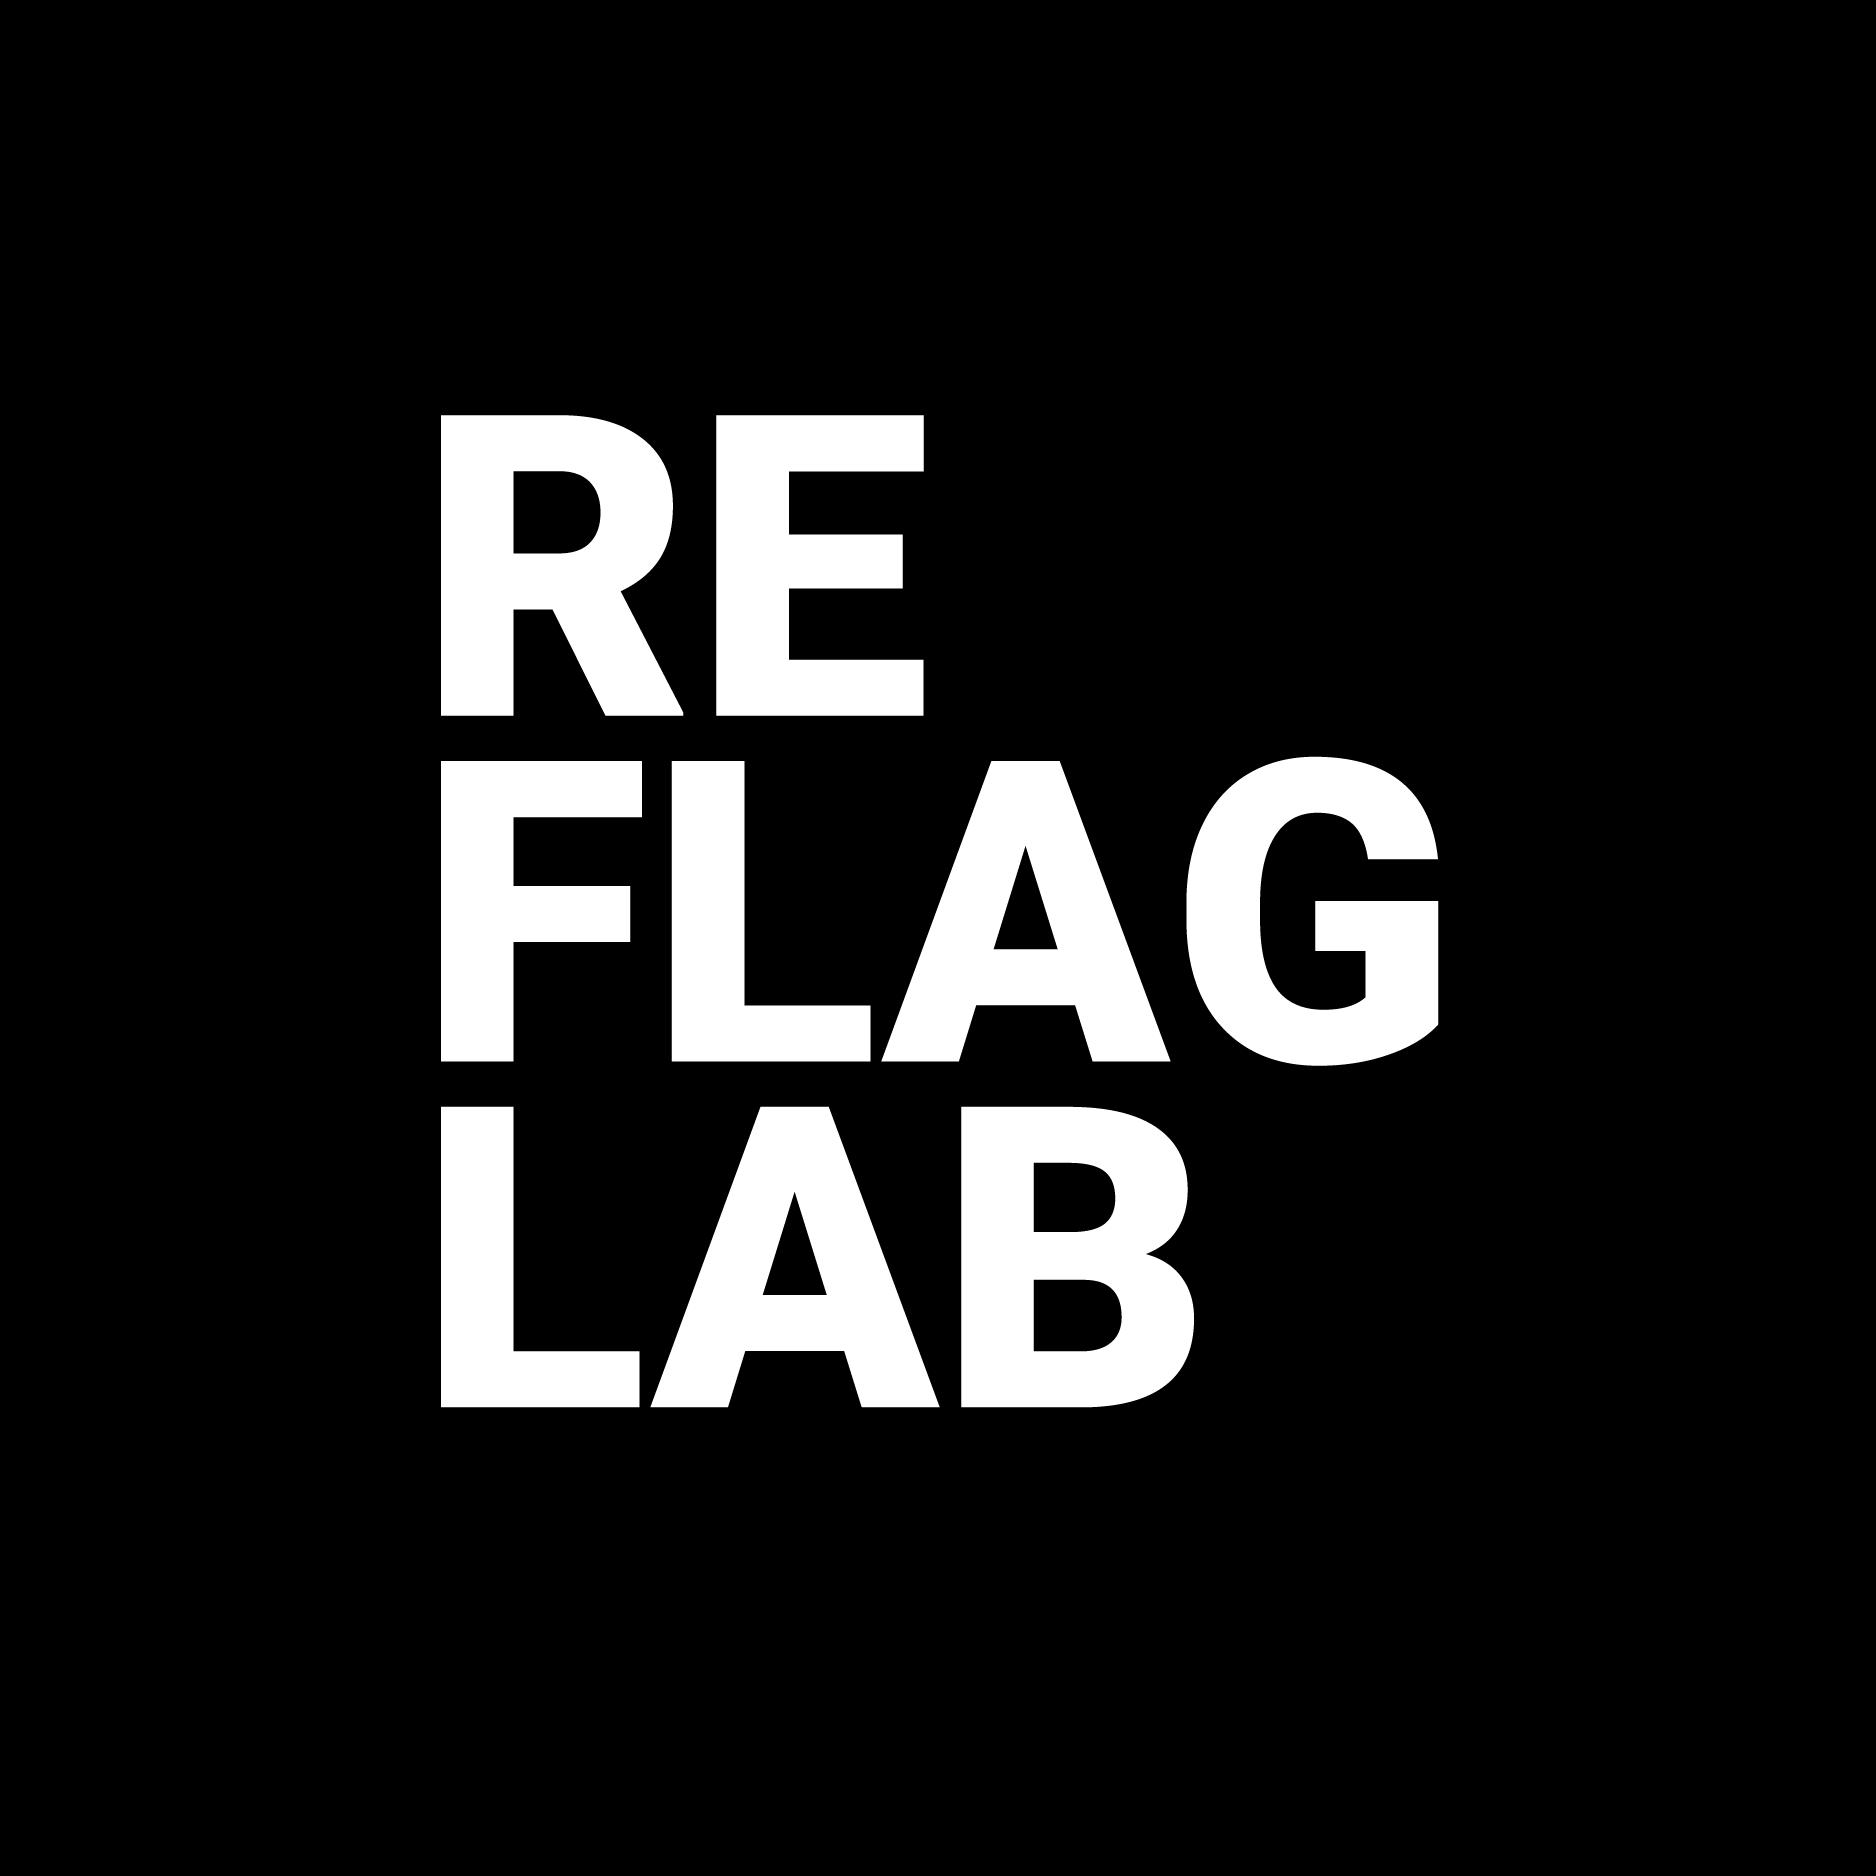 Reflag Lab